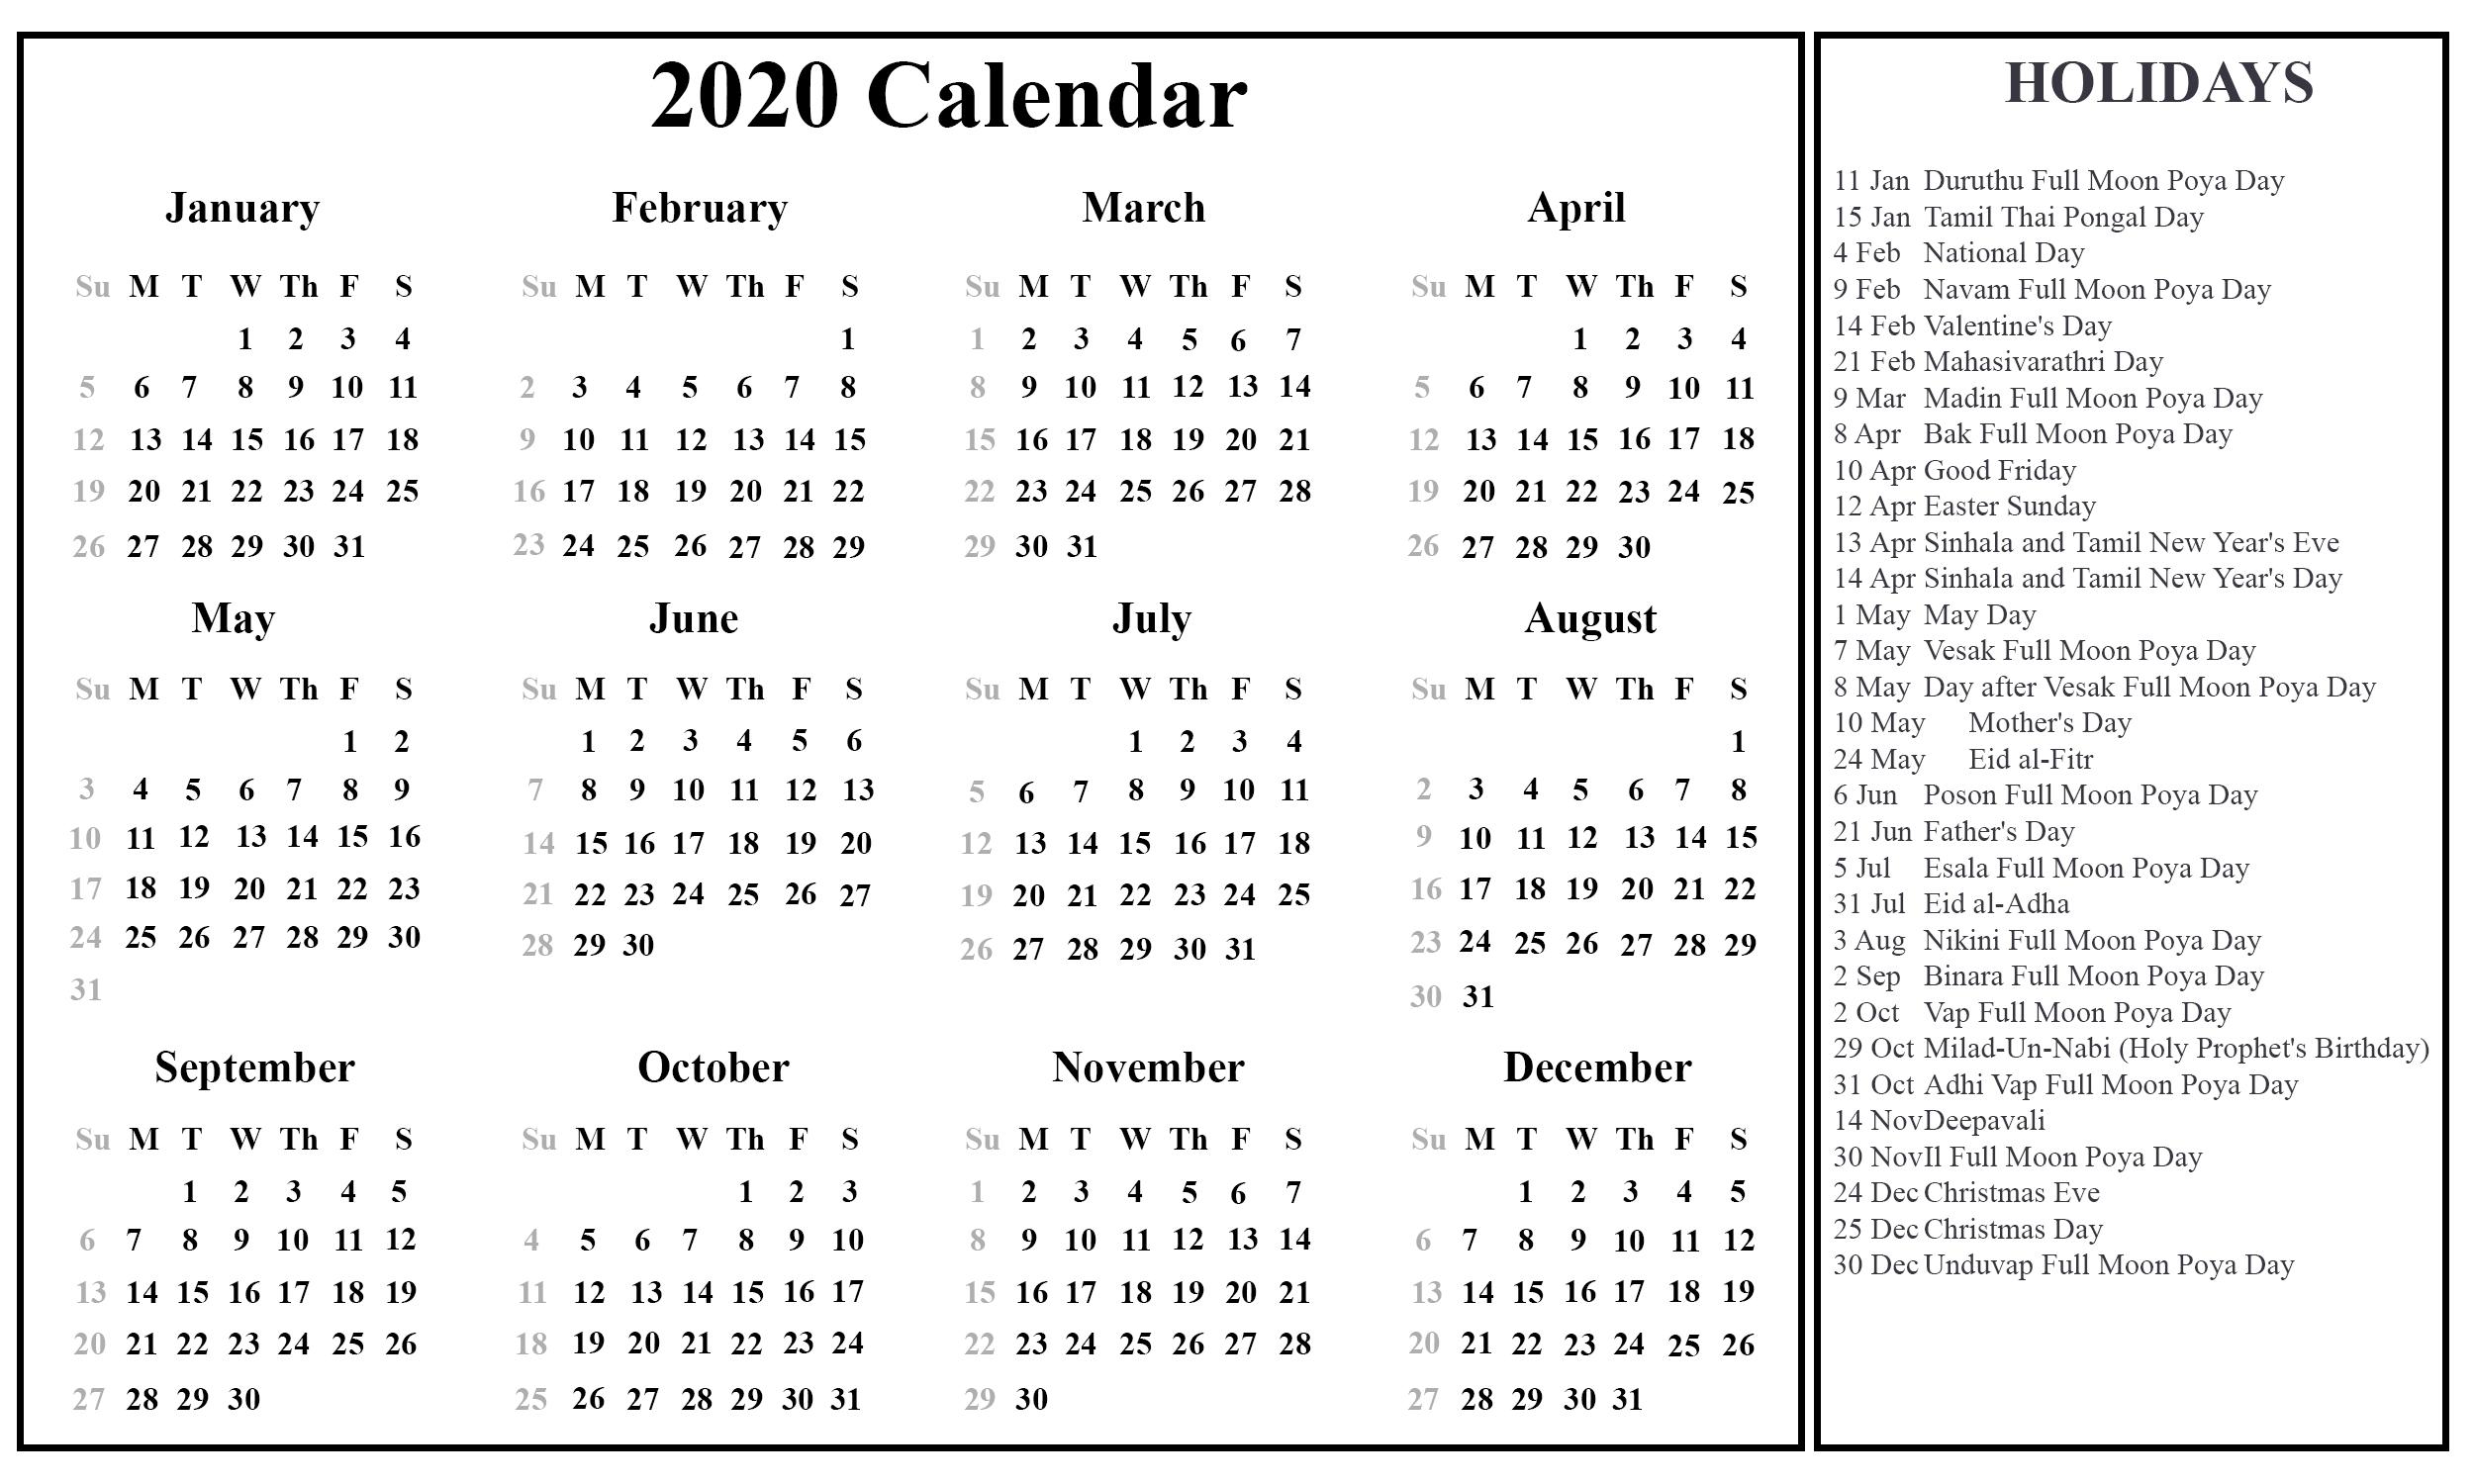 Printable Free Download Sri Lanka Calendar 2020 [Pdf, Excel-2020 Holidays Printable List